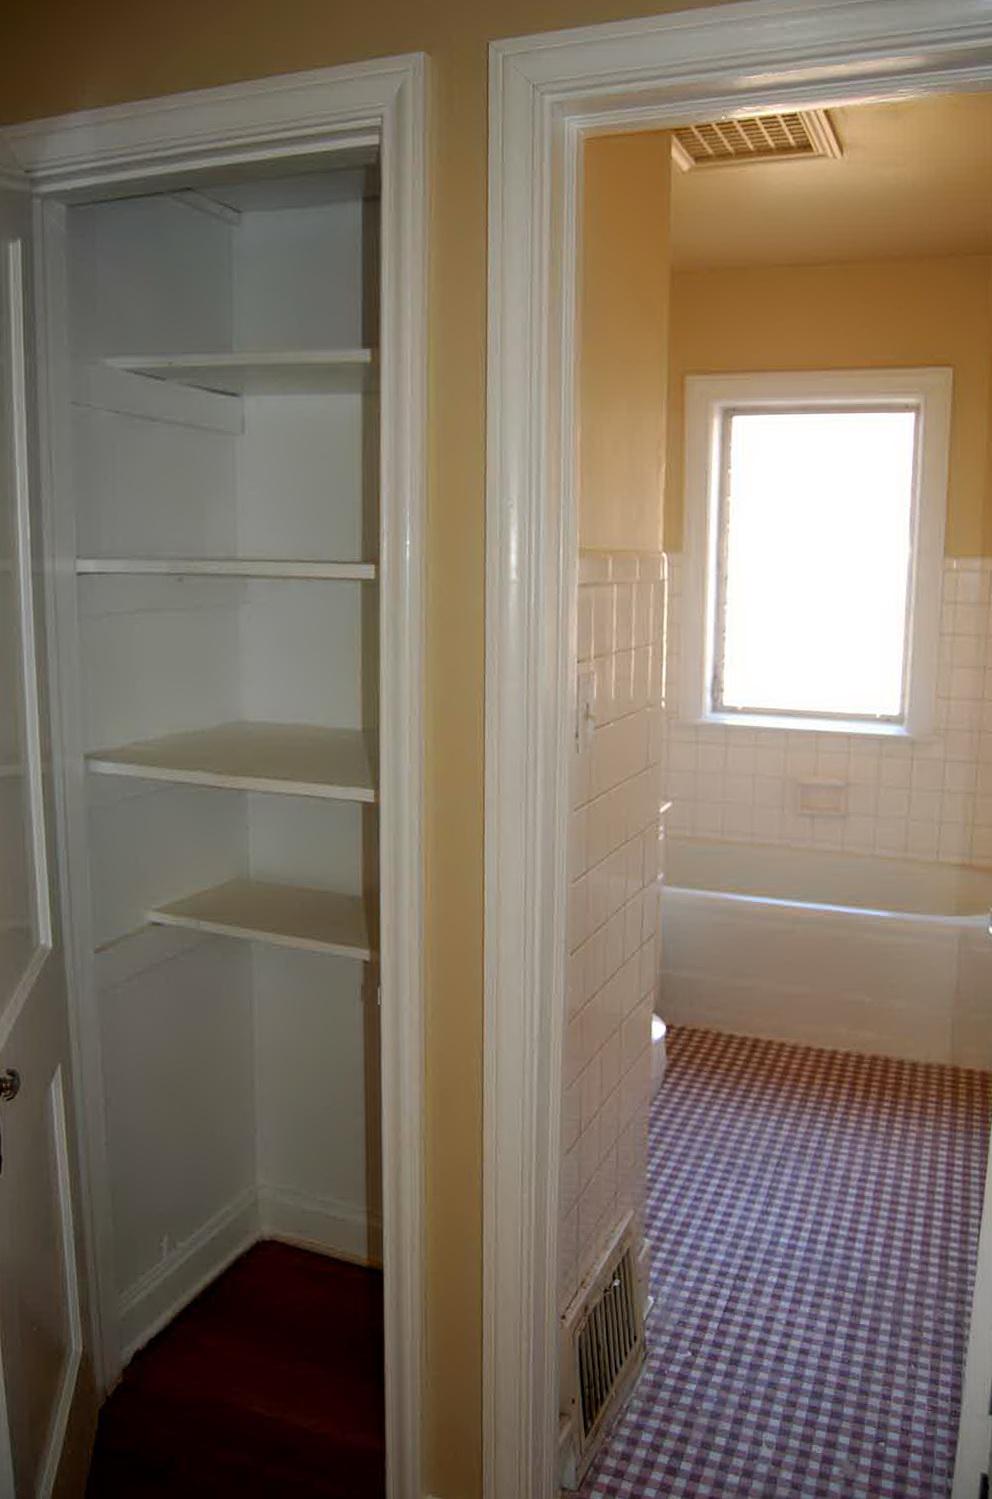 Bathroom Linen Closet Storage Ideas